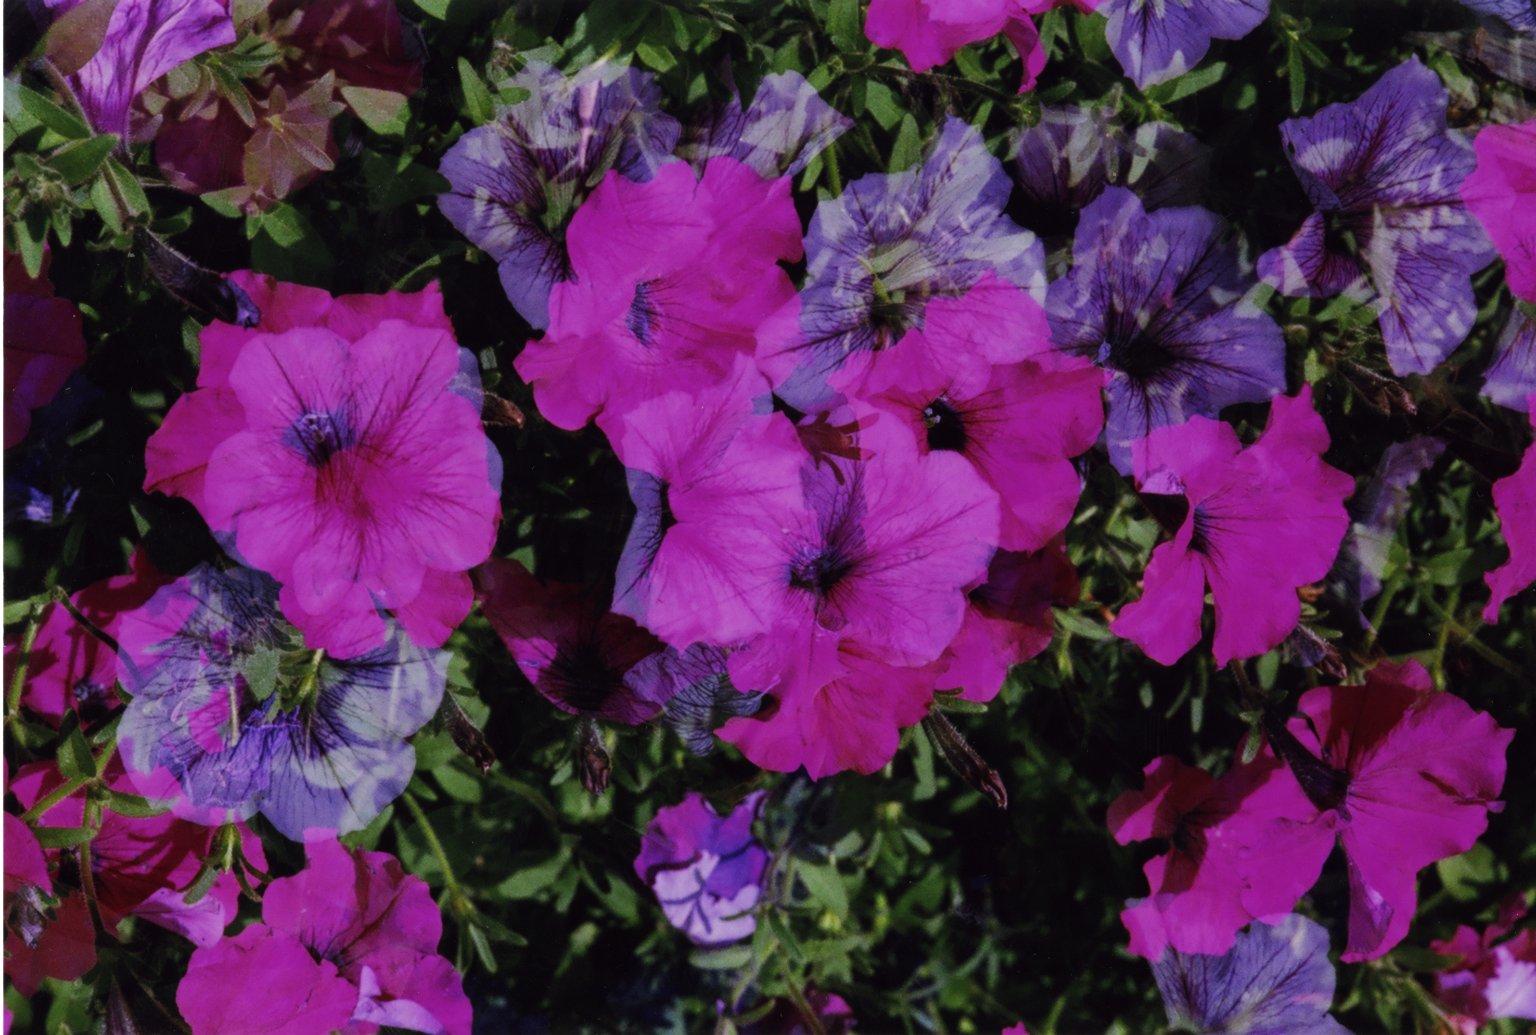 Doouble Exposure- Red flowers over pink flowers